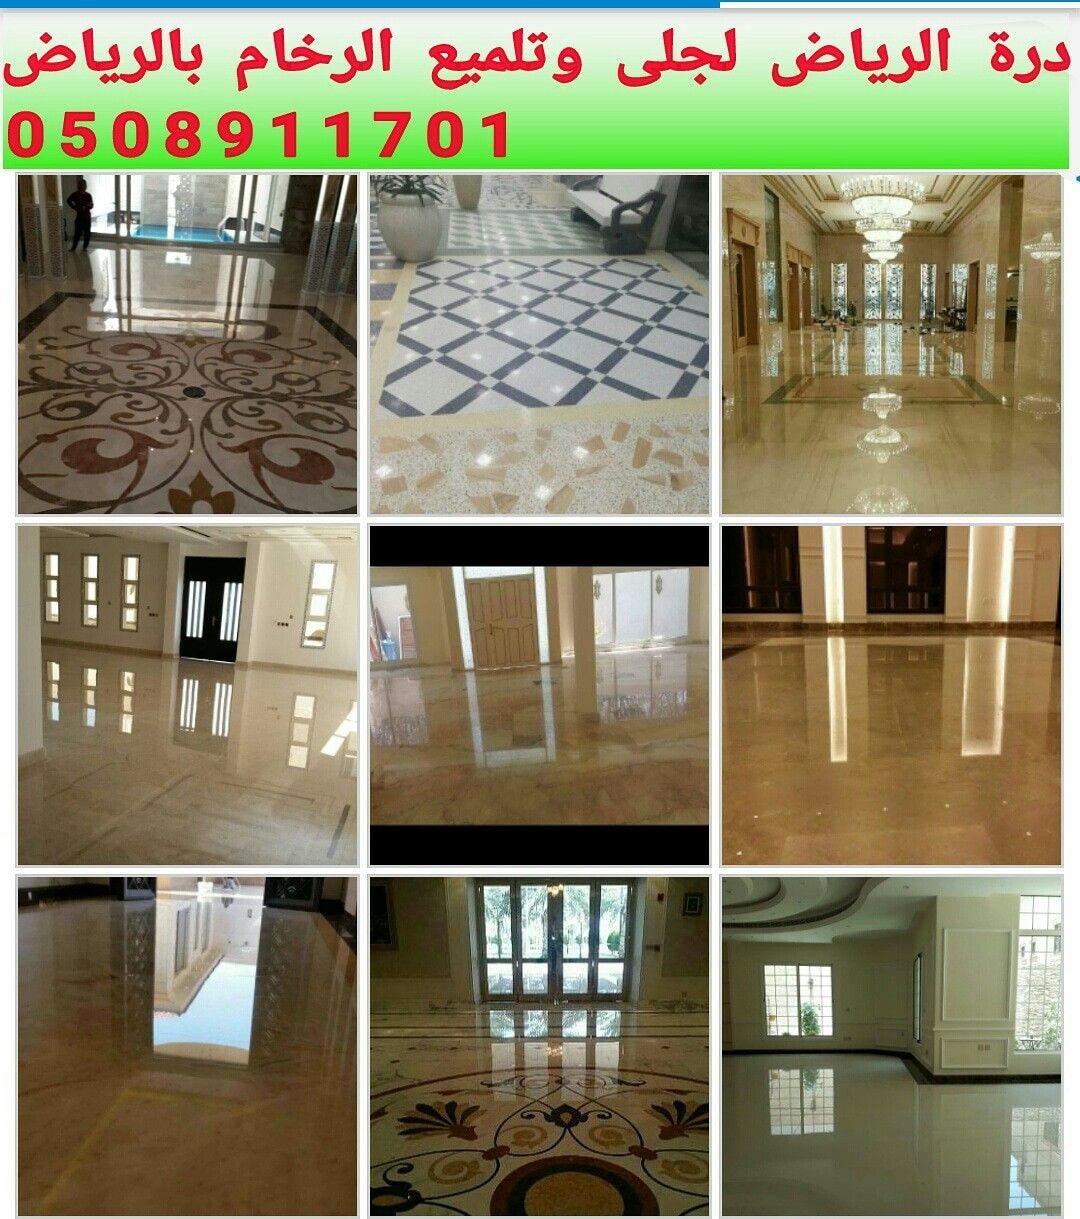 جلي رخام بالرياض 0508911701 جلي رخام بالرياض Flooring Tile Floor Home Decor